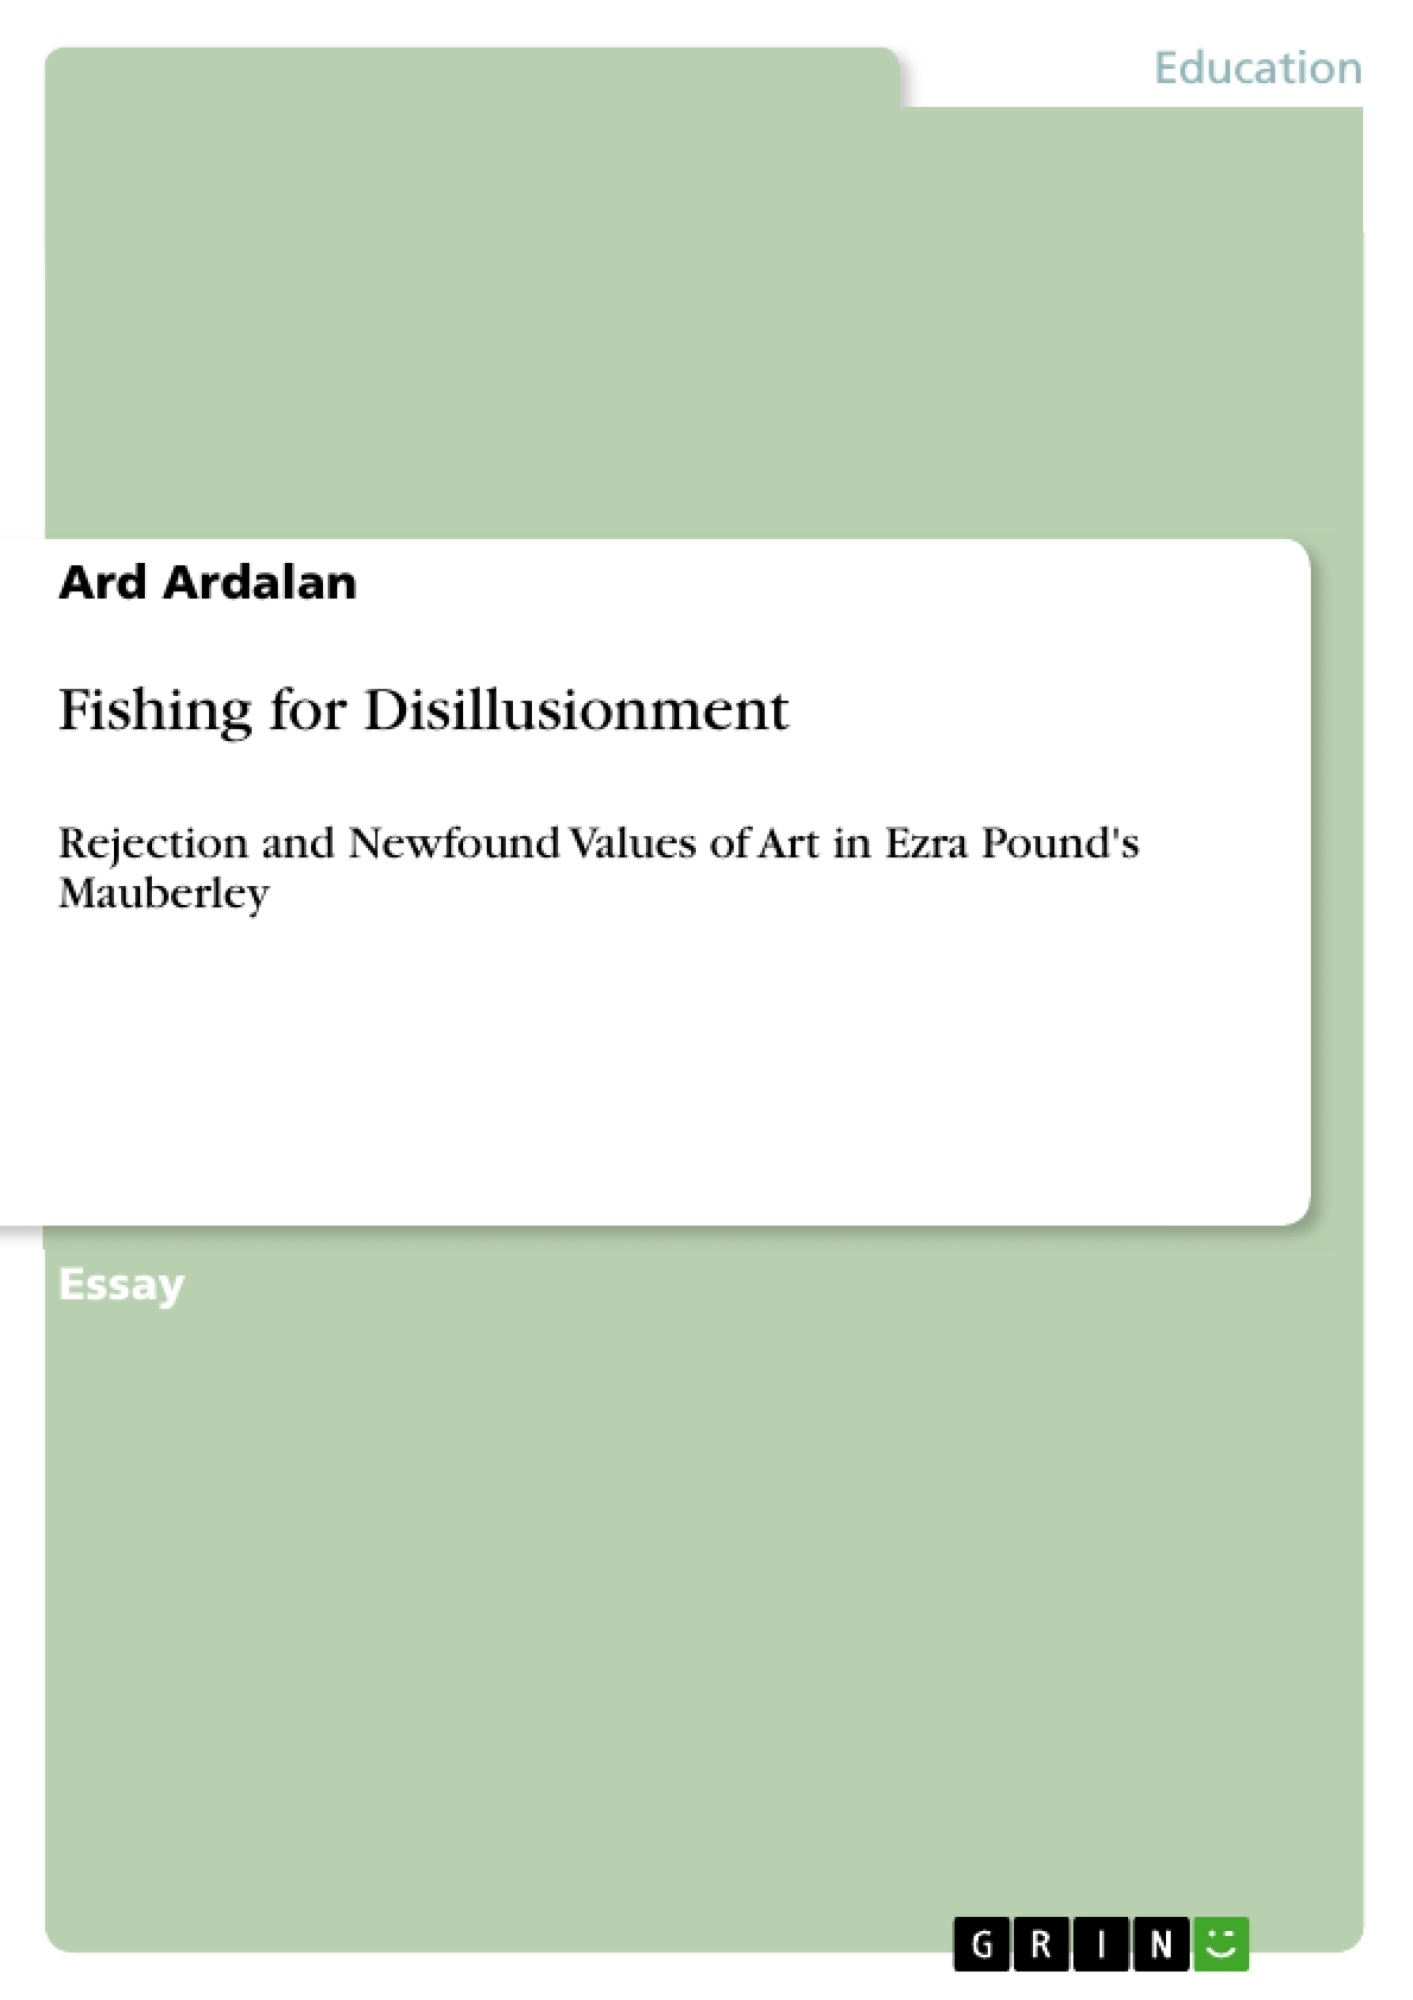 Disillusionment Essays (Examples)